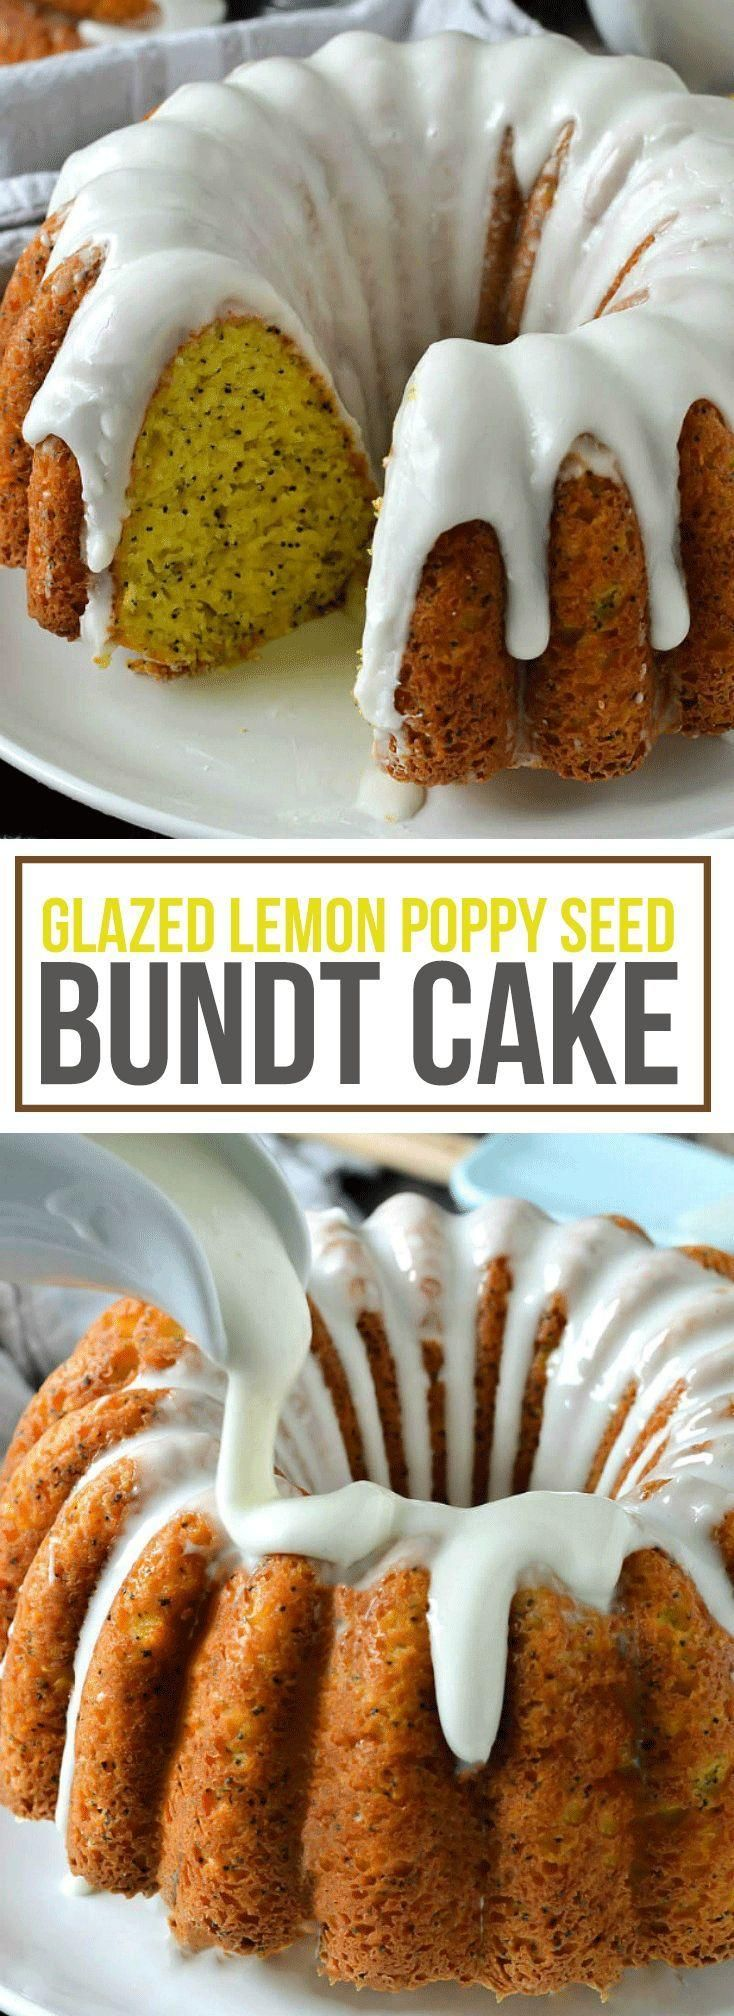 Glazed Lemon Poppy Seed Bundt Cake - Bundt Cakes -